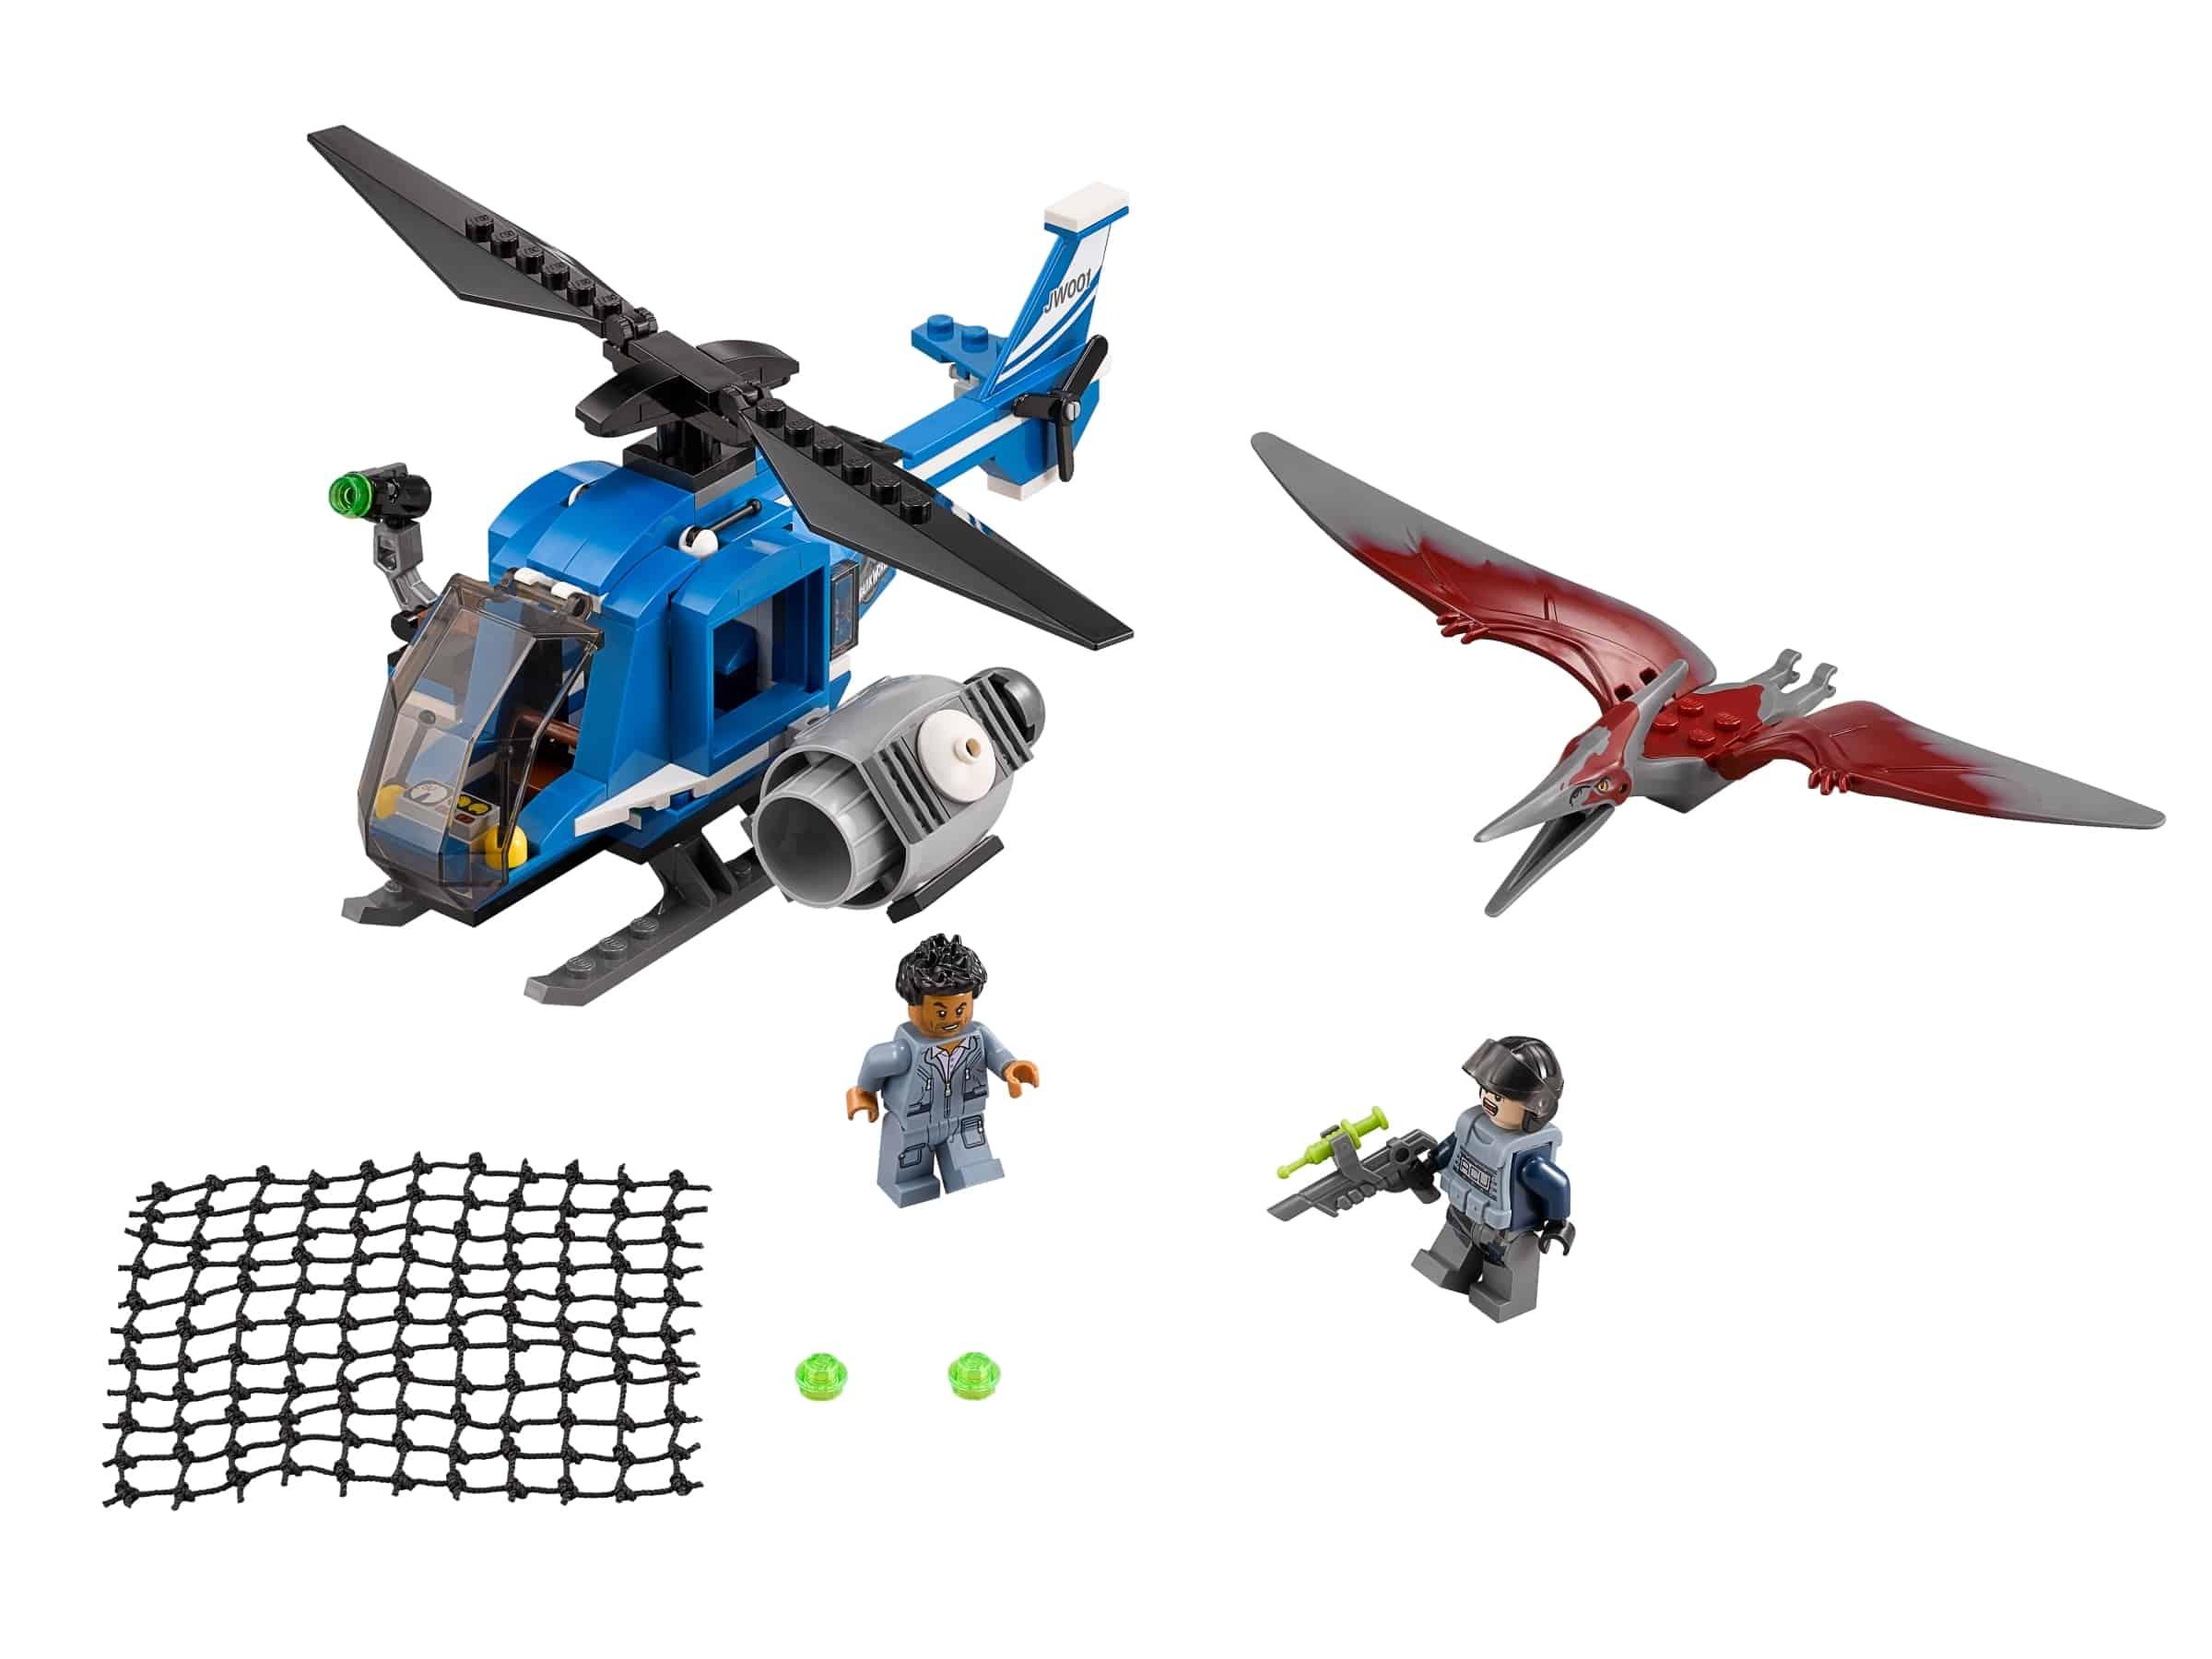 lego pteranodonvangst 75915